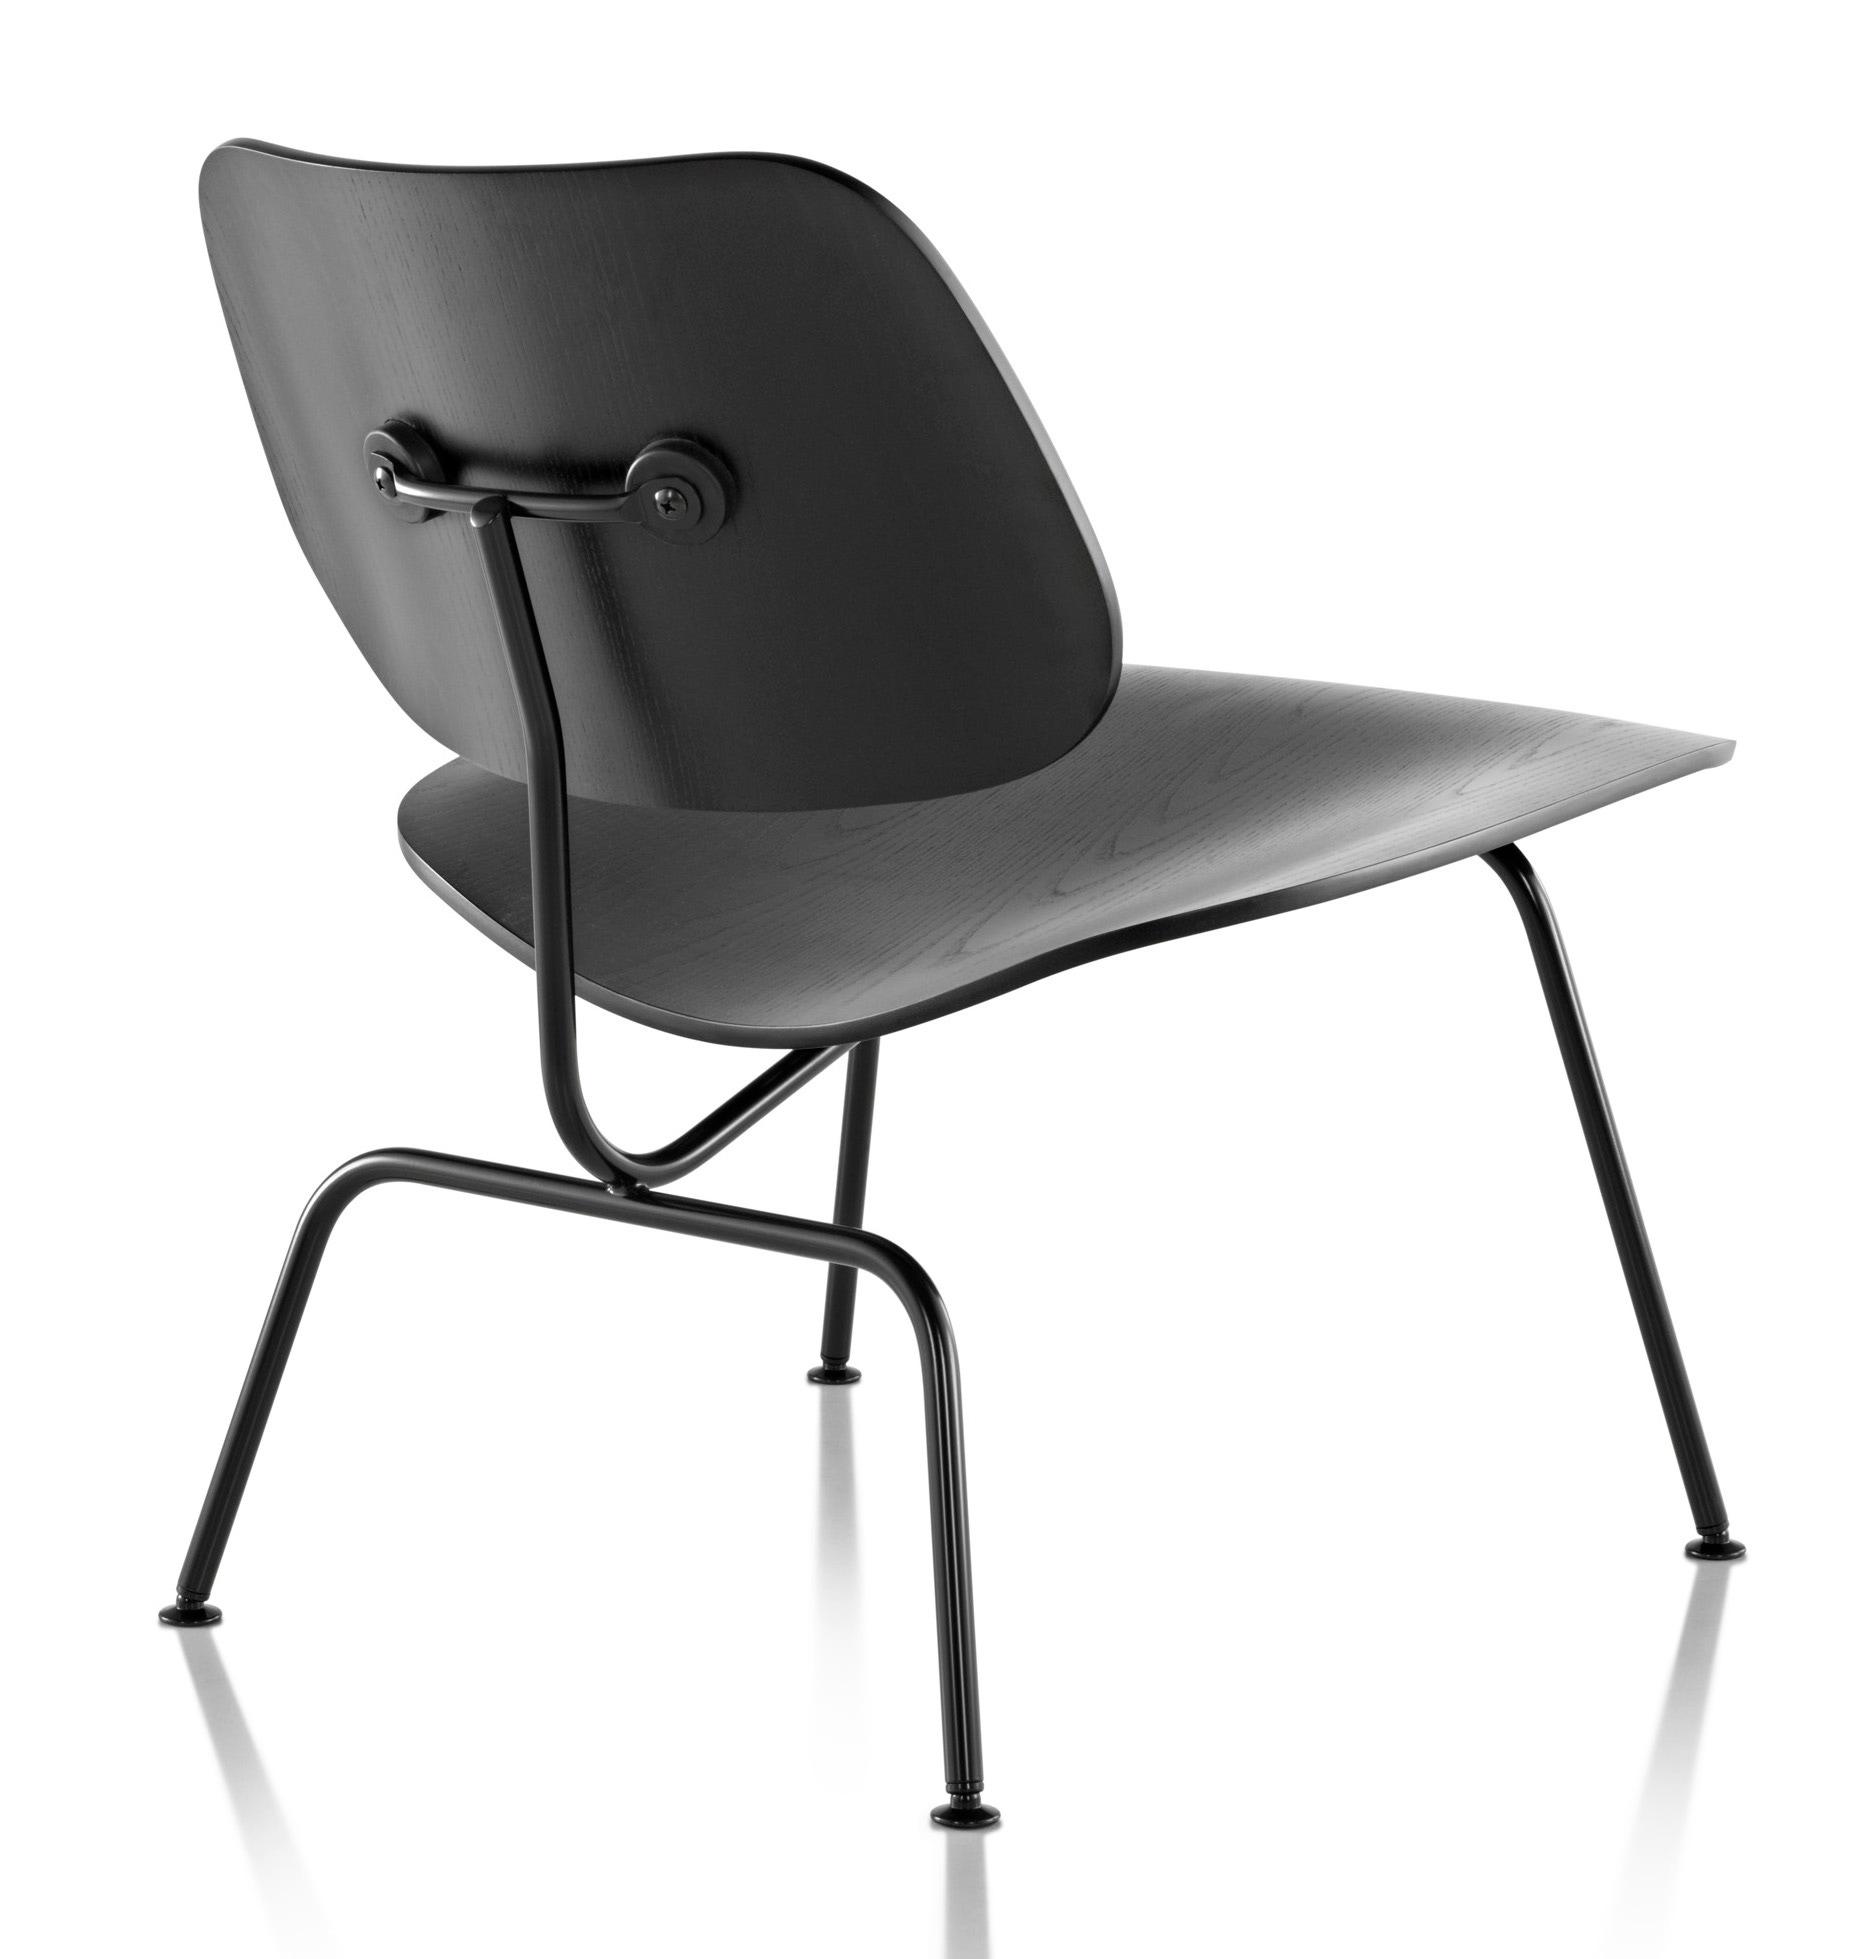 Herman miller eames molded plywood lounge chair metal for Eames herman miller lounge chair